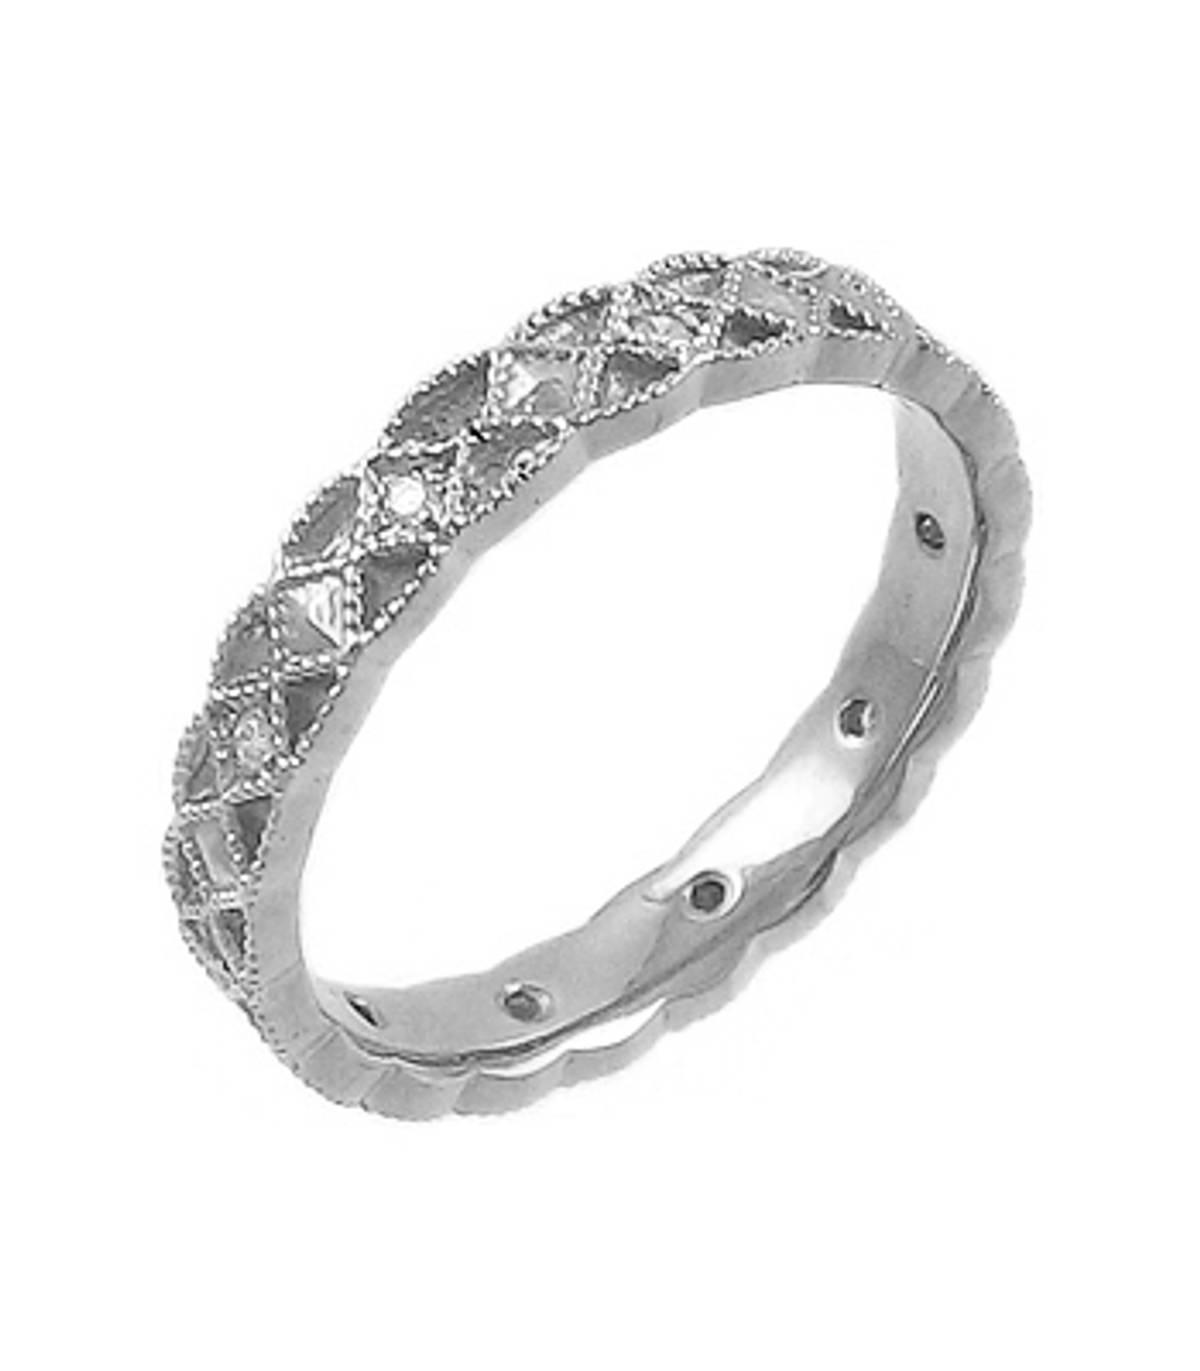 14k gold brilliant cut diamond Celtic wedding ring Total diamonds weight  0.08cts  H/I VS1